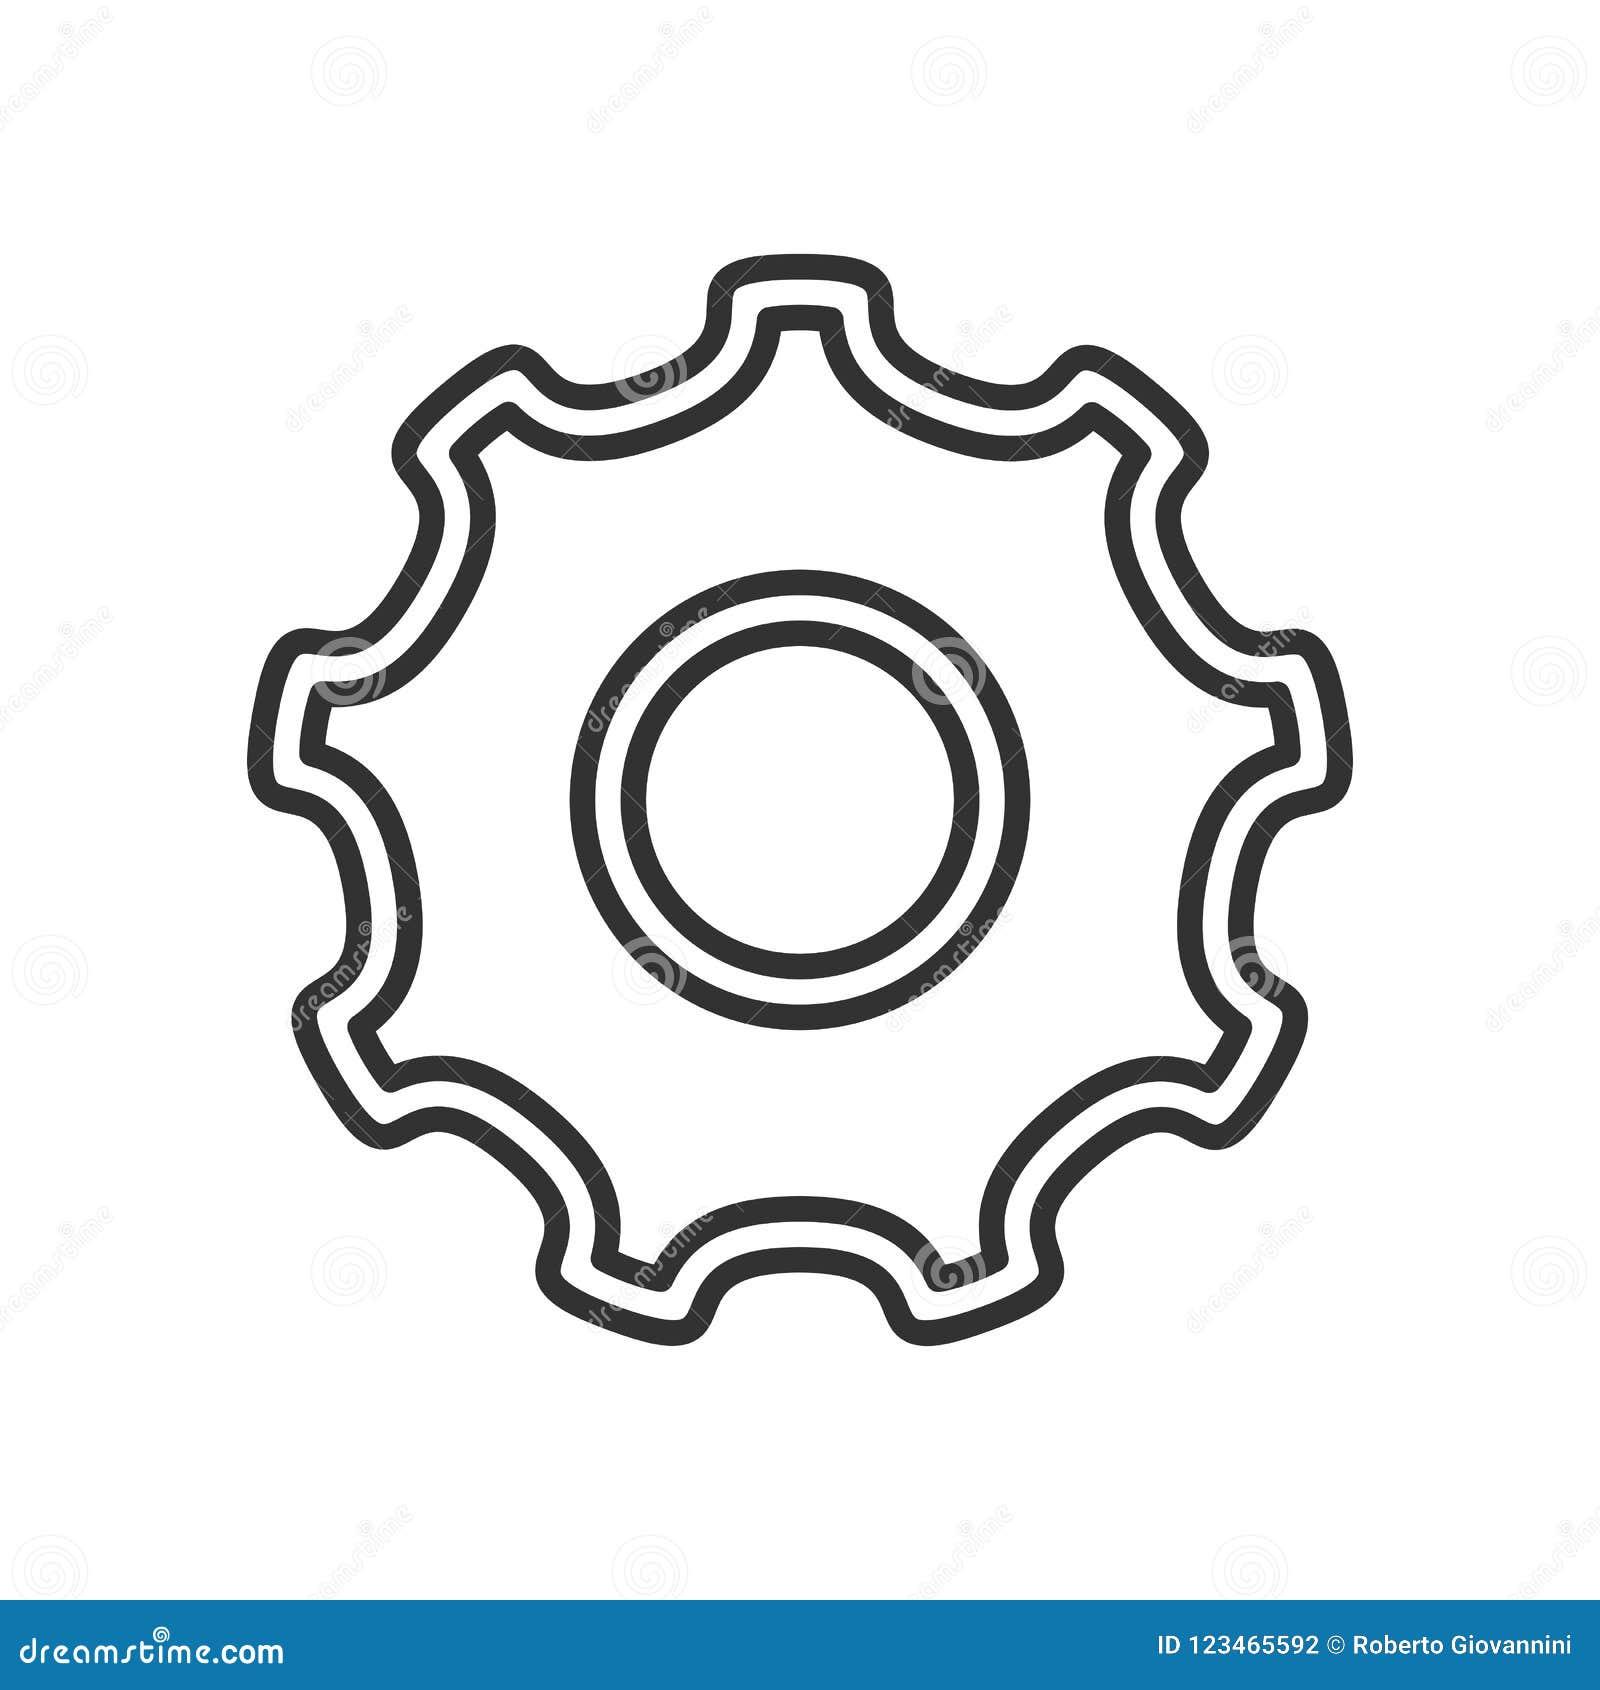 Tool Gear Wheel Outline Flat Icon on White